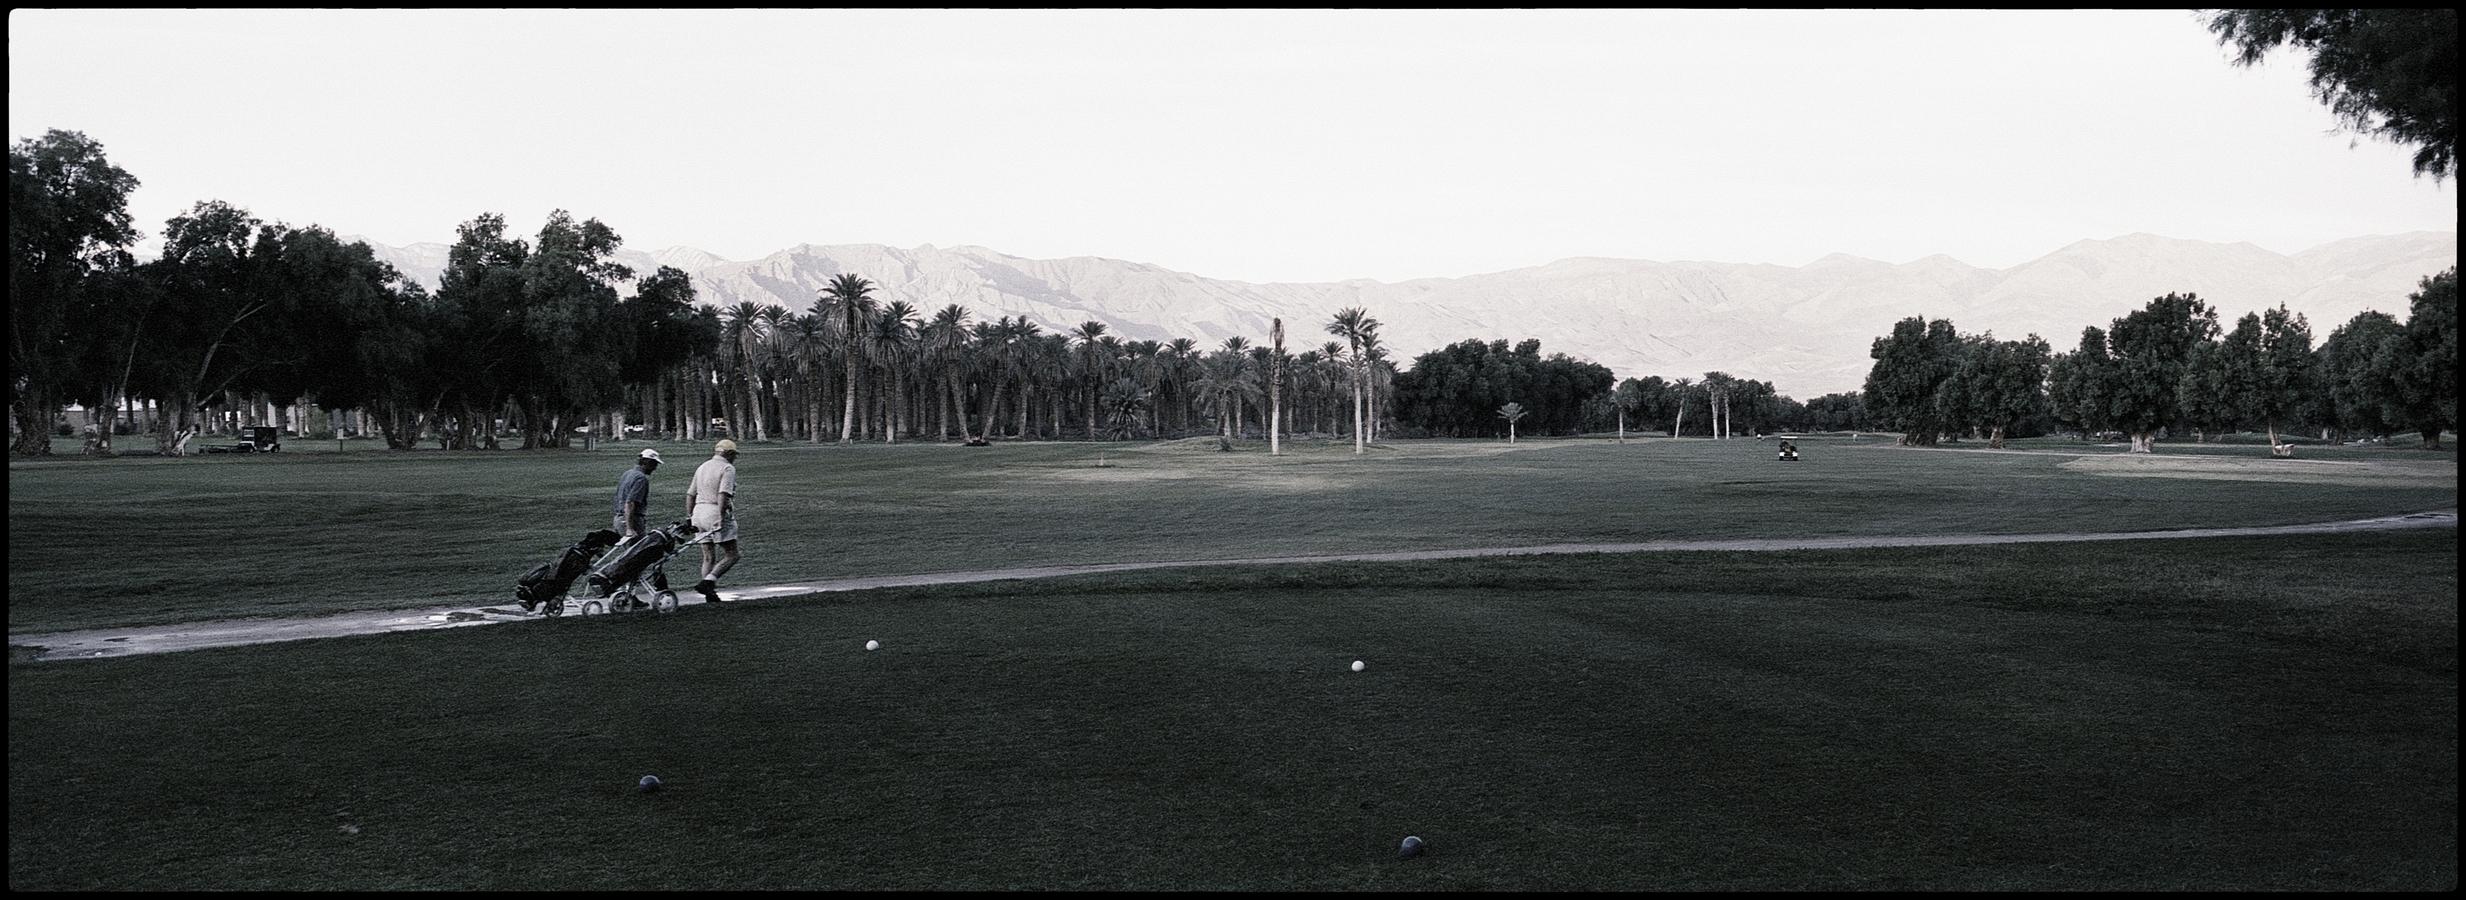 Furnace Creek Ranch Golf Course, Death Valley, Mojaves Desert, CA, USA.